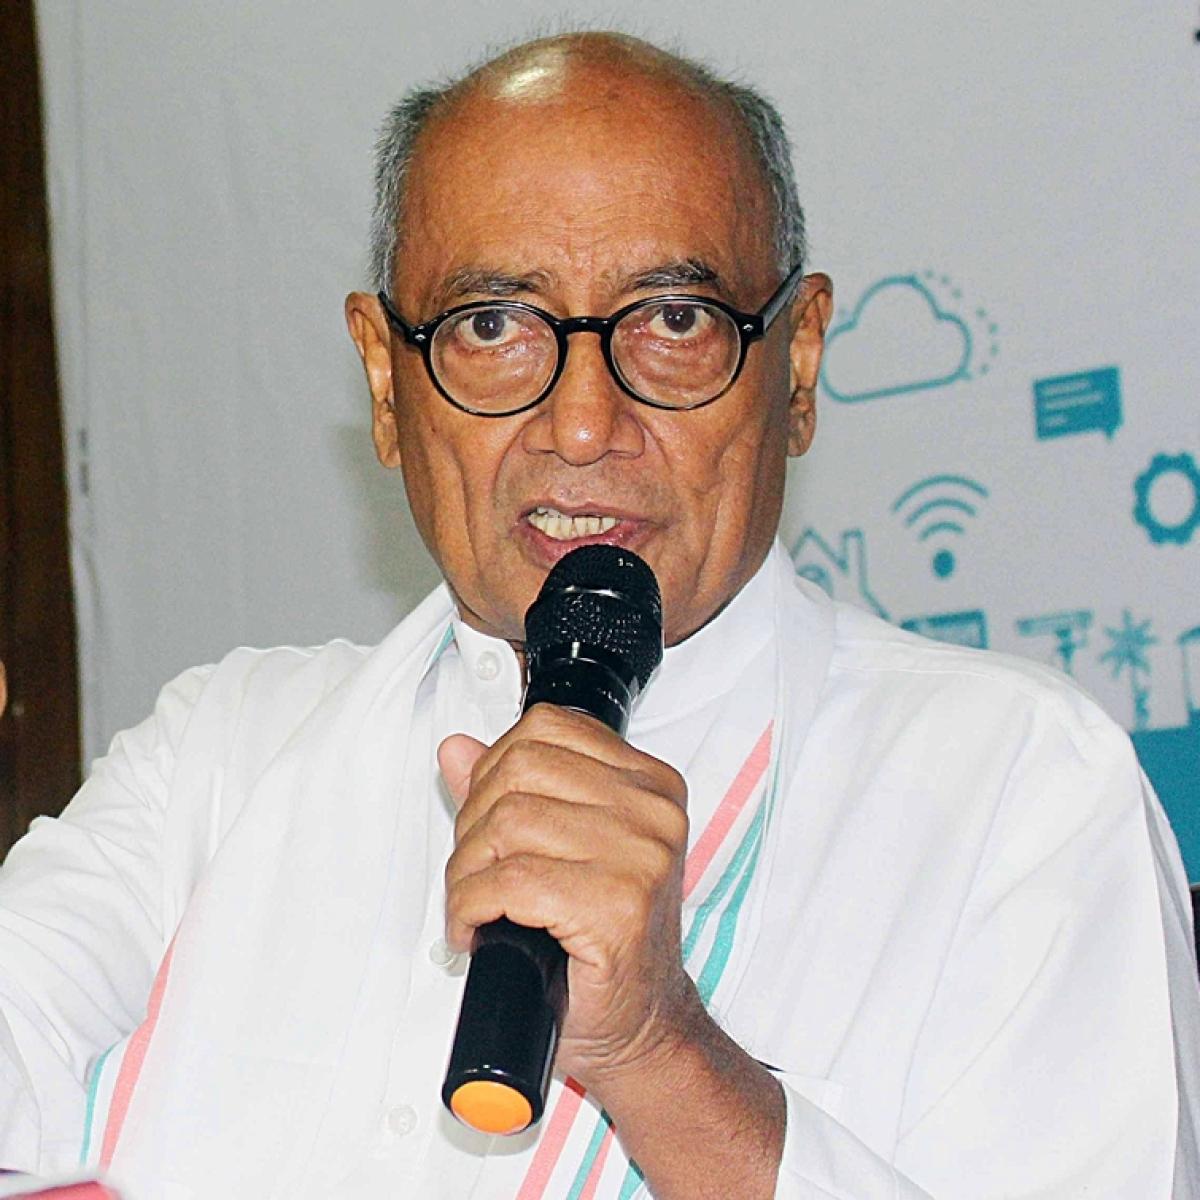 Kamal Nath 'Item' Row: When Digvijaya Singh called Congress MP Meenakshi Natrajan 'tunch maal'